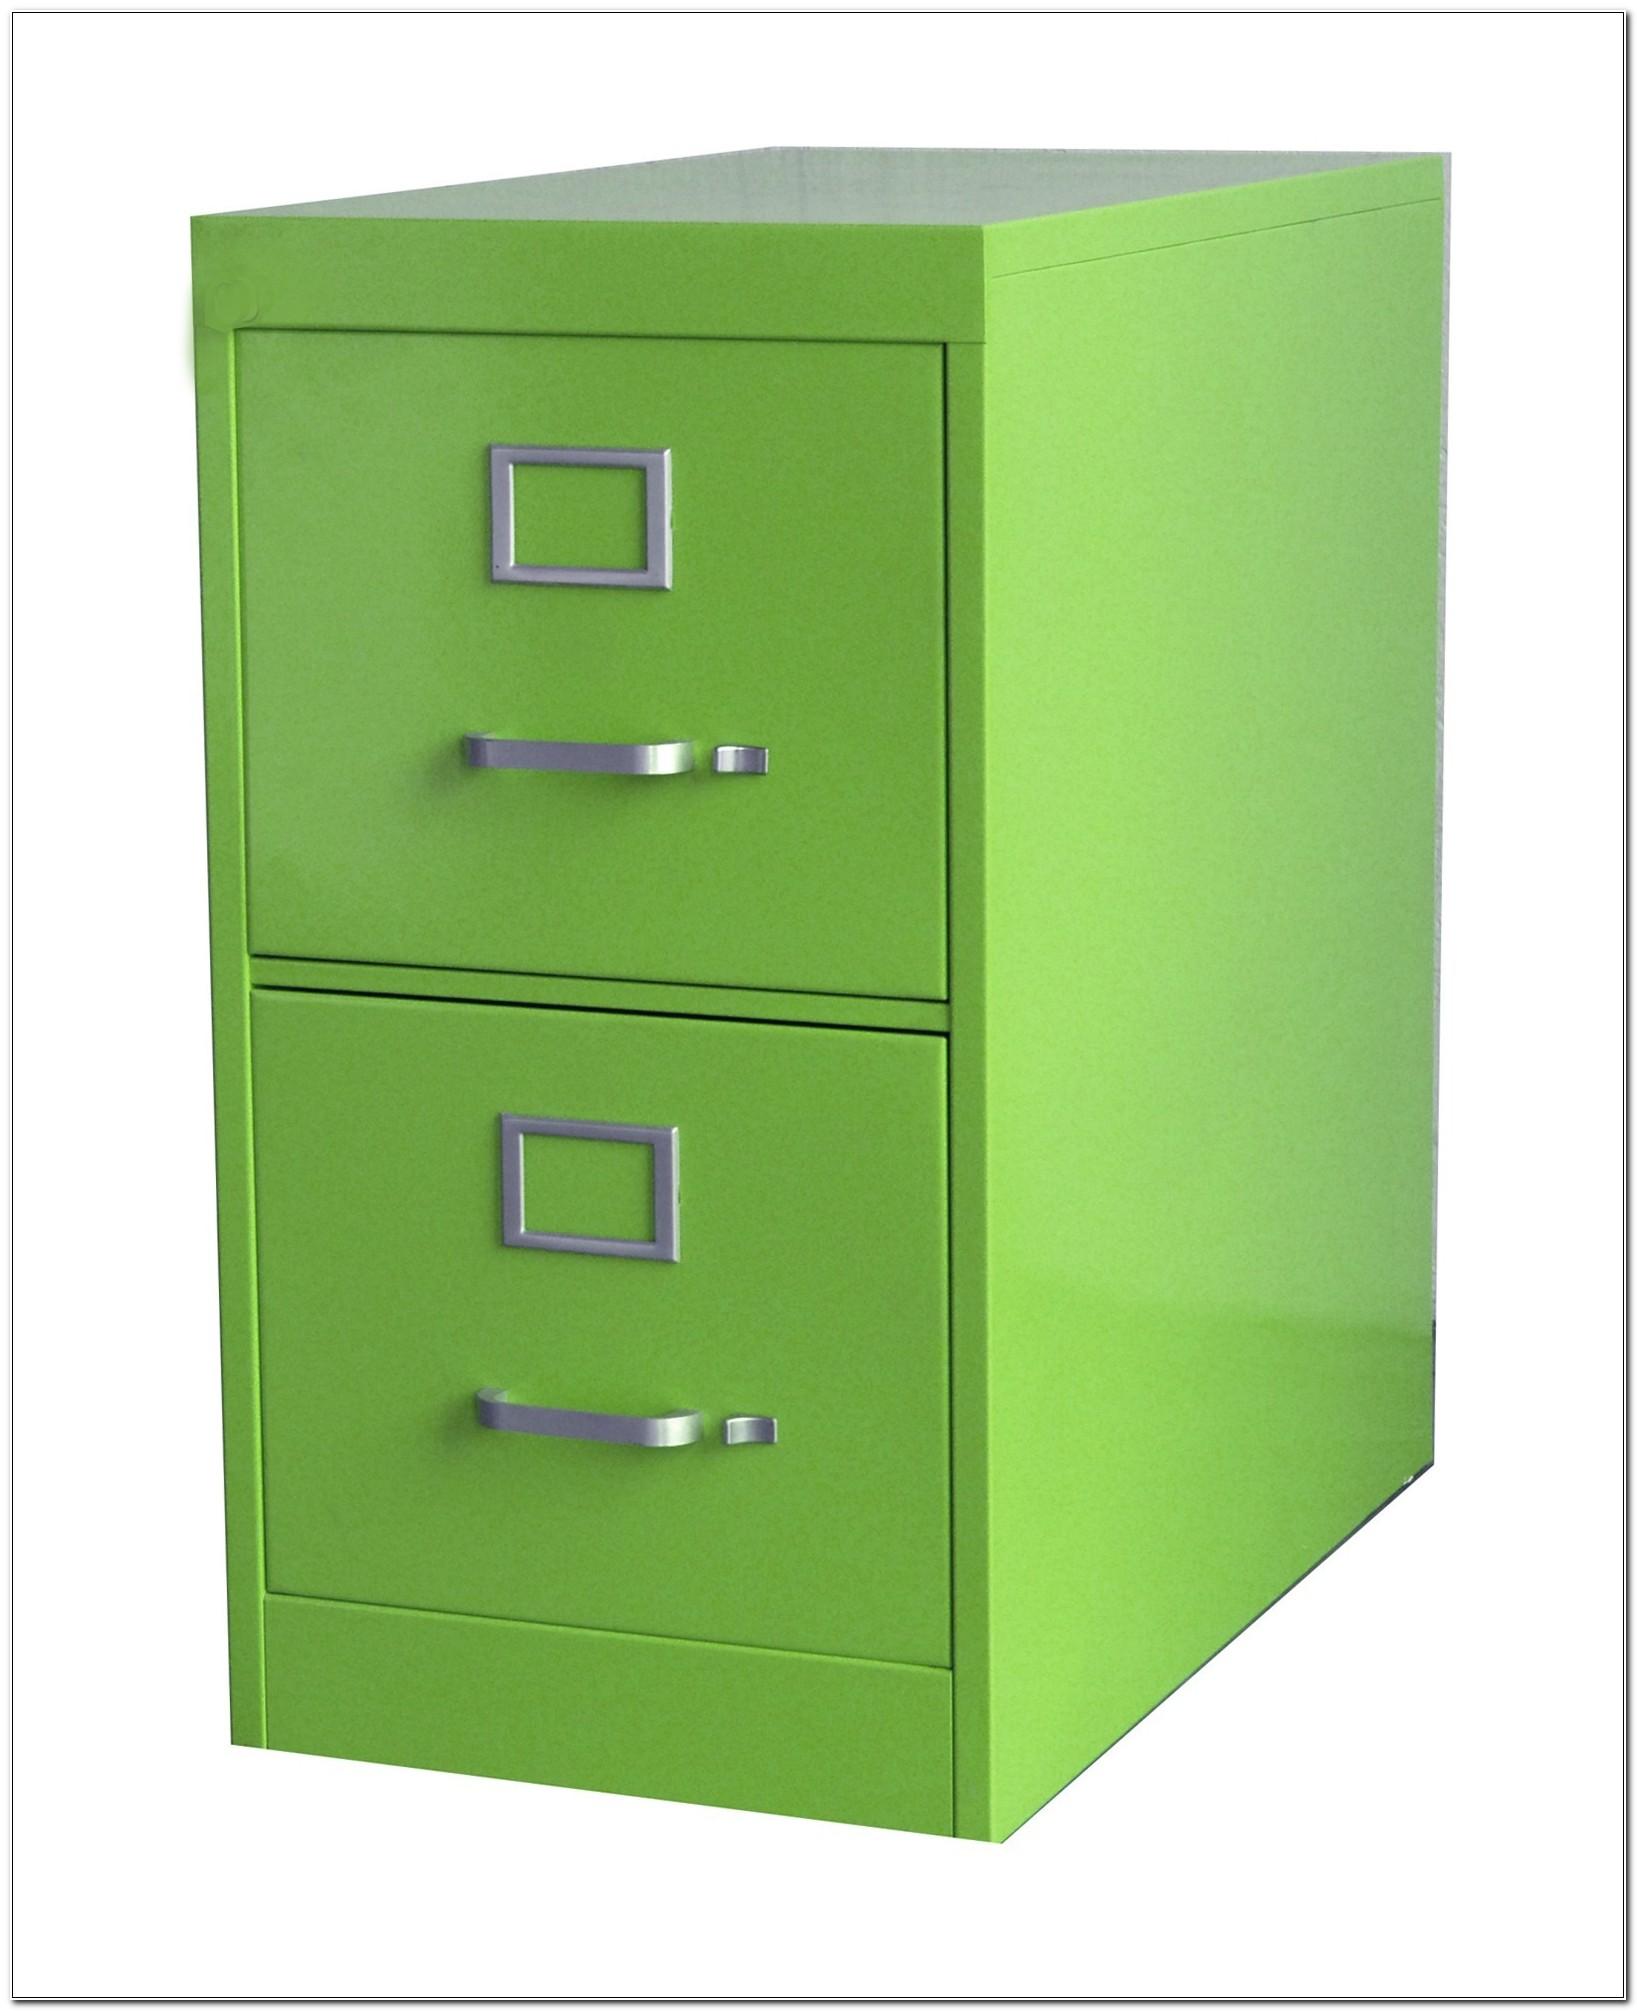 Lock For Hon 2 Drawer File Cabinet